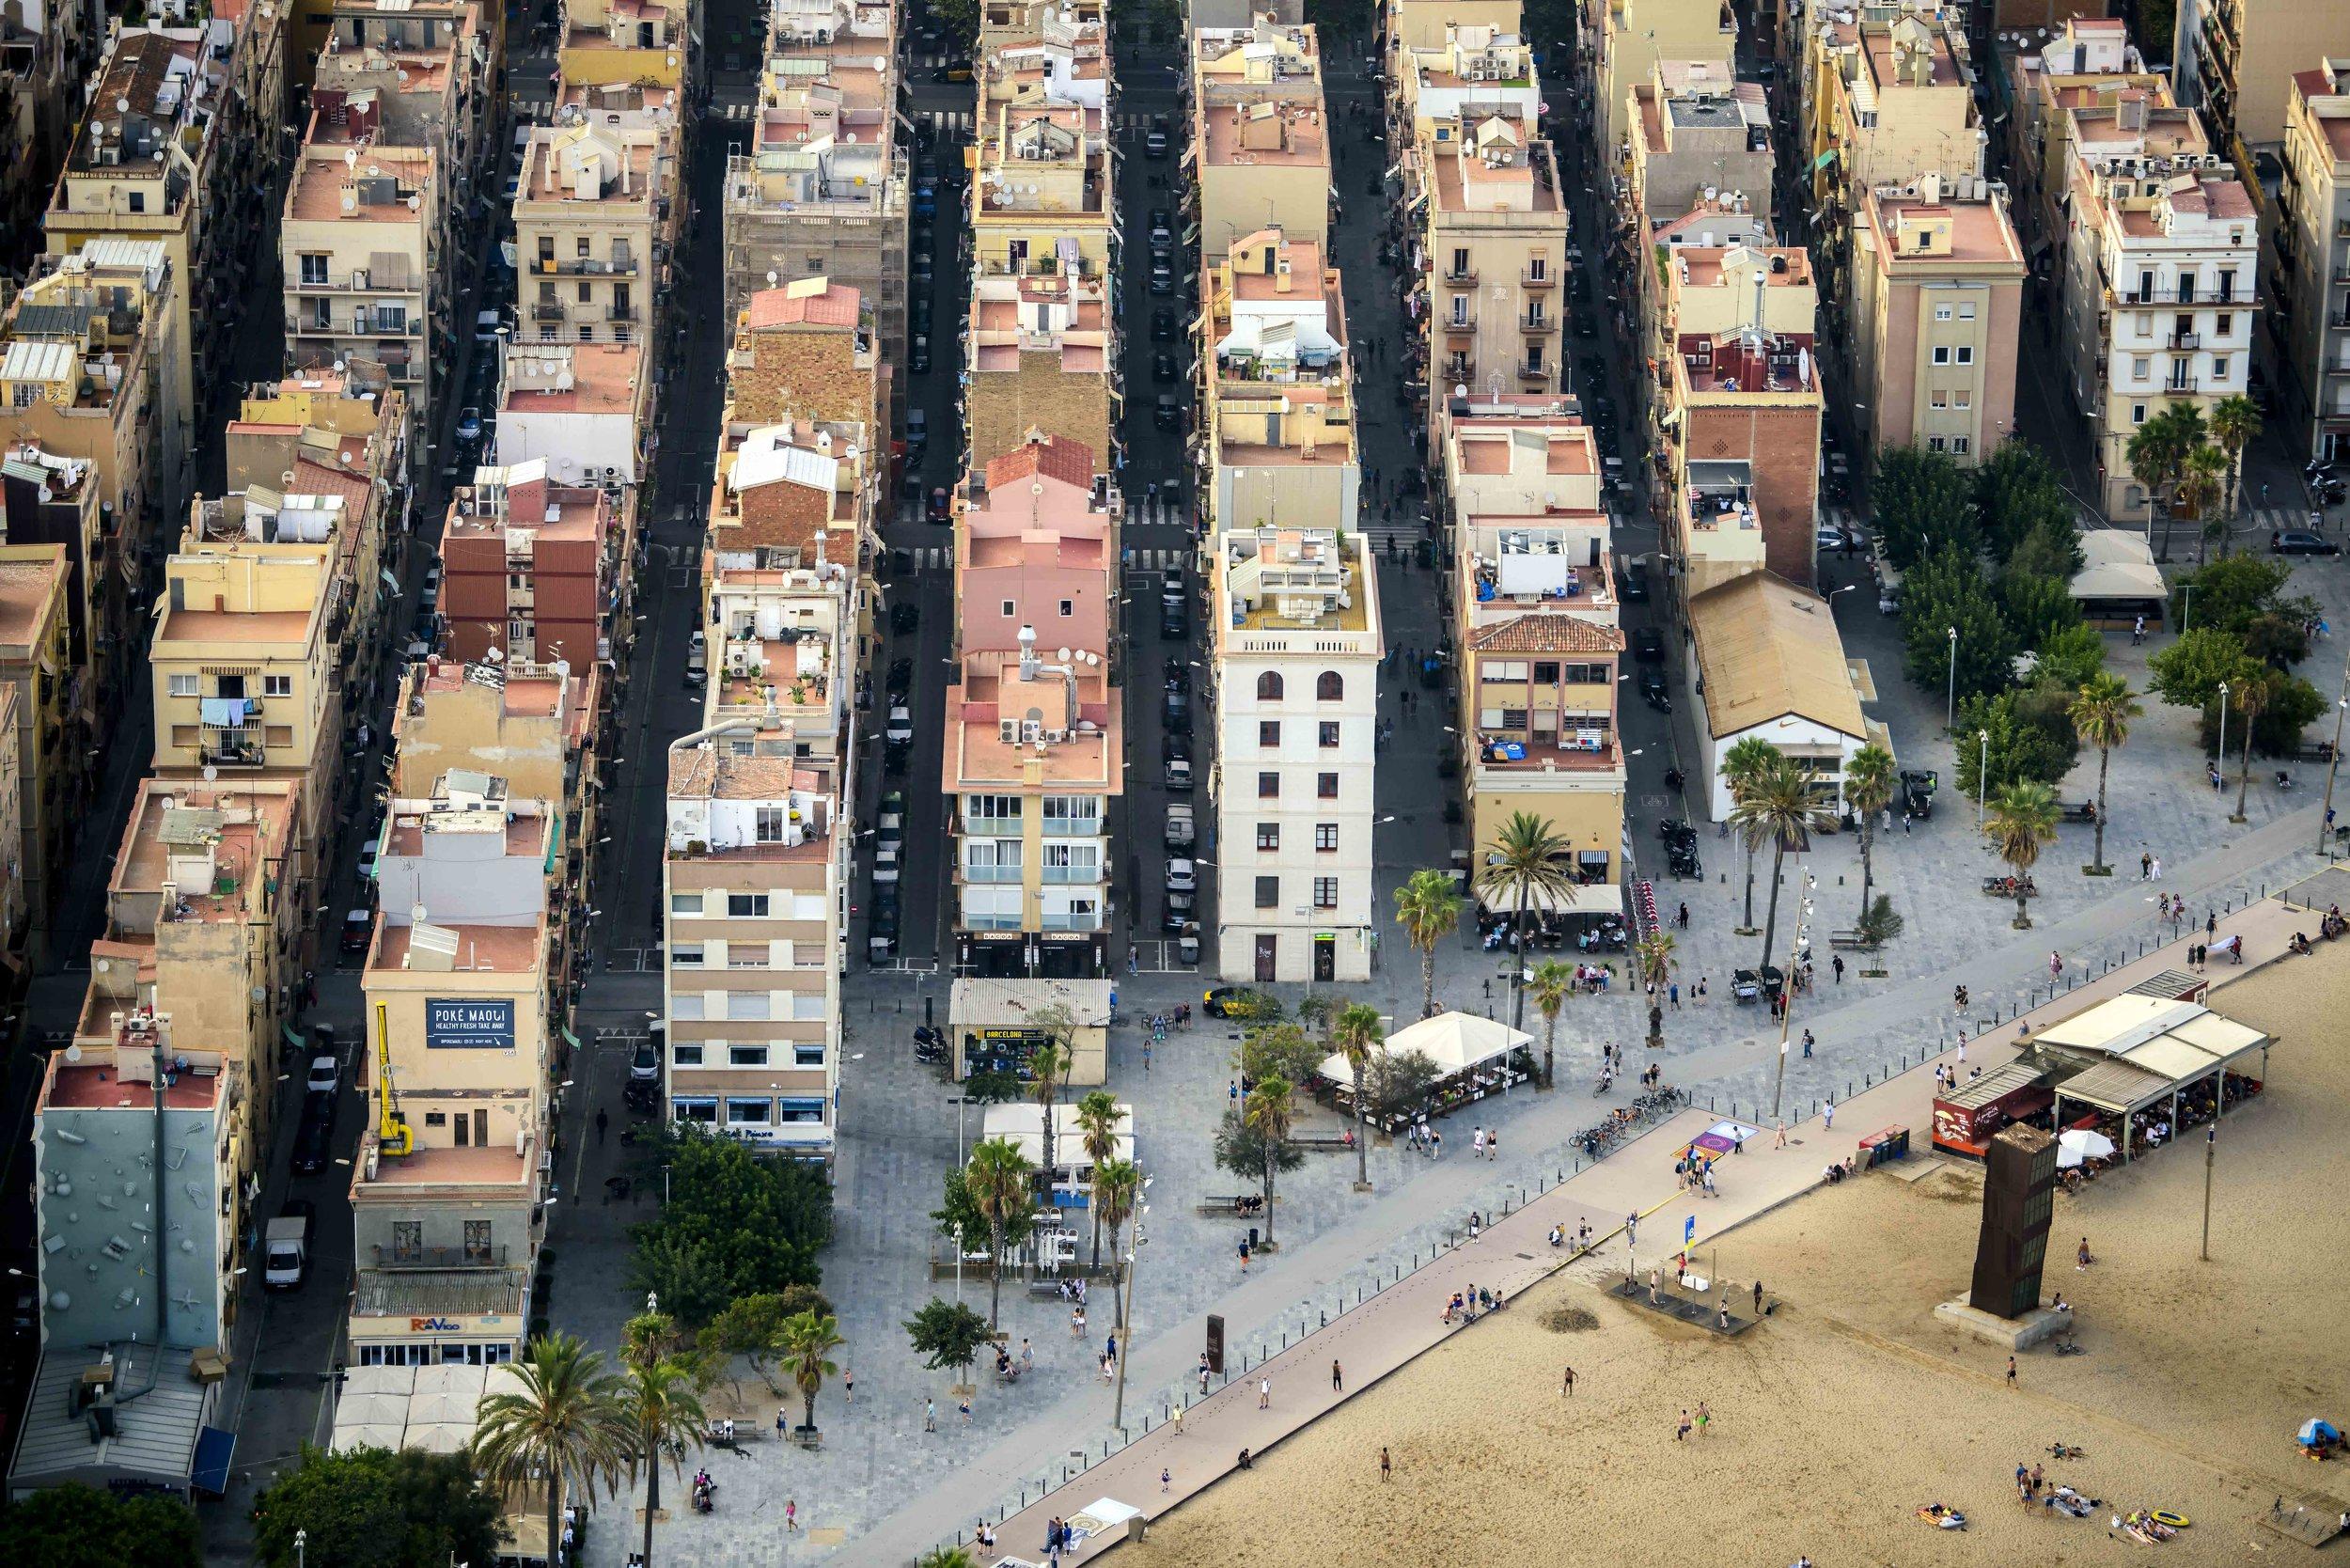 LfA - Barceloneta Streets 1